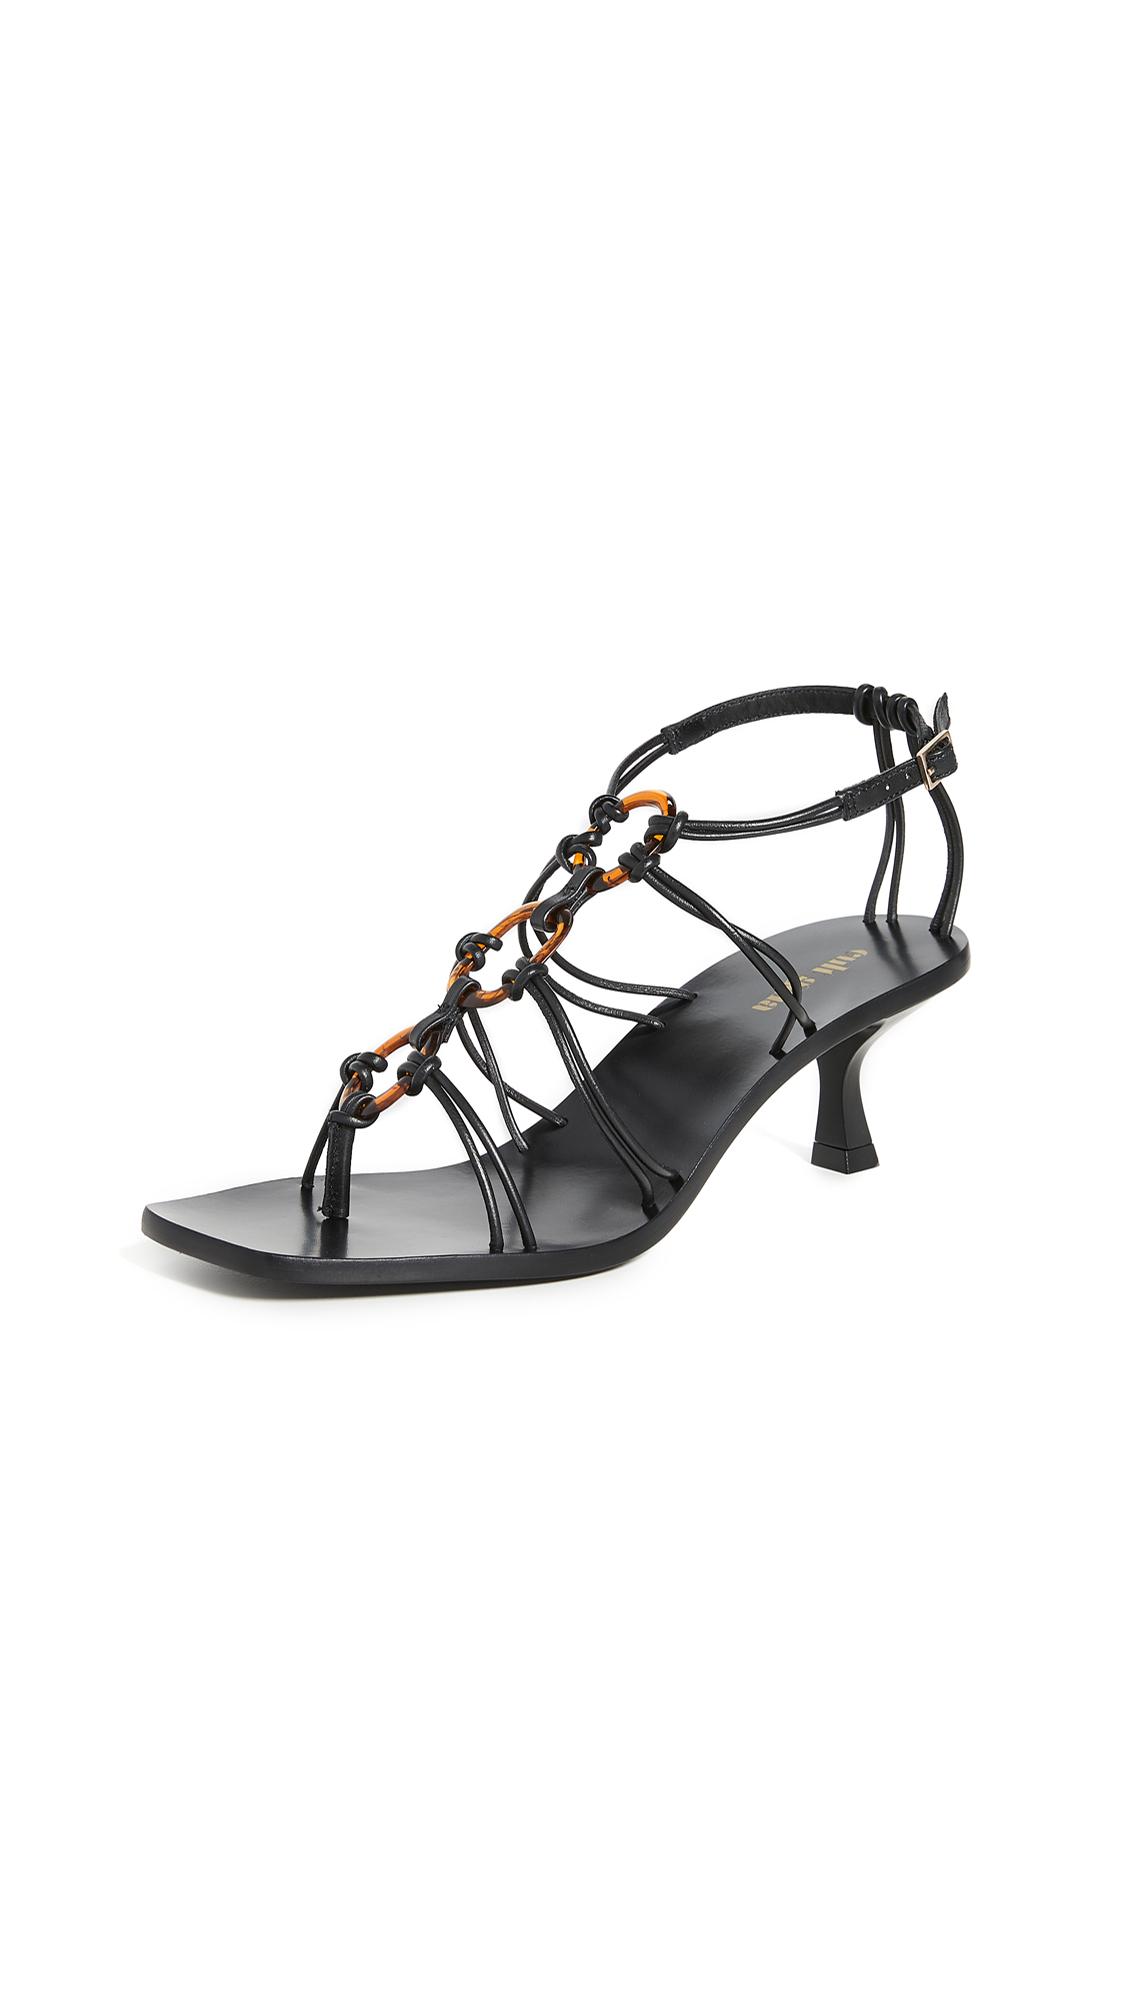 Cult Gaia Ziba Sandals - 50% Off Sale